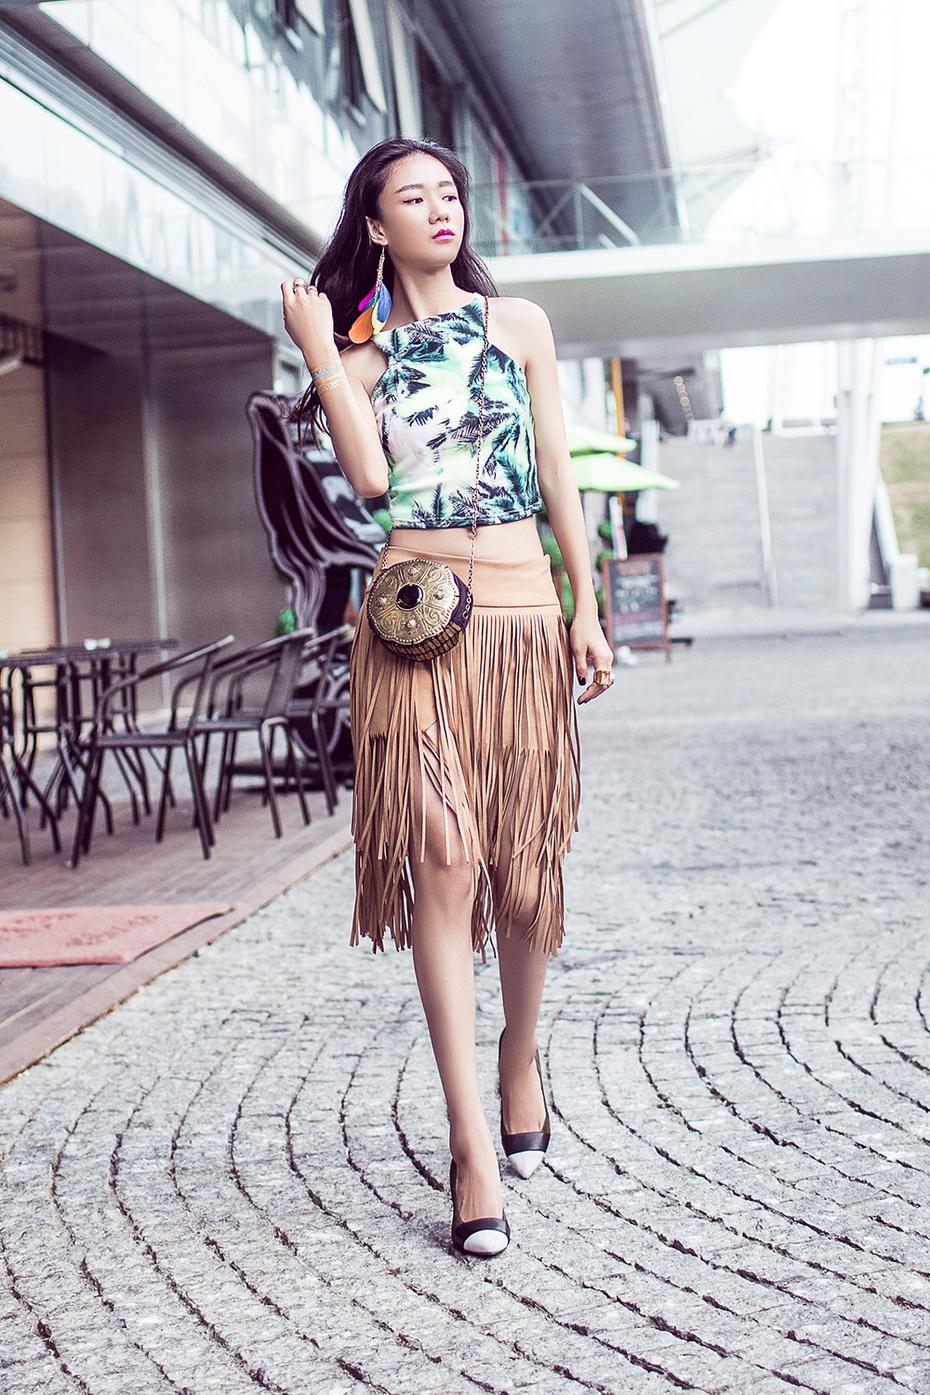 [Ava搭配日记]小色彩 - AvaFoo - Avas Fashion Blog